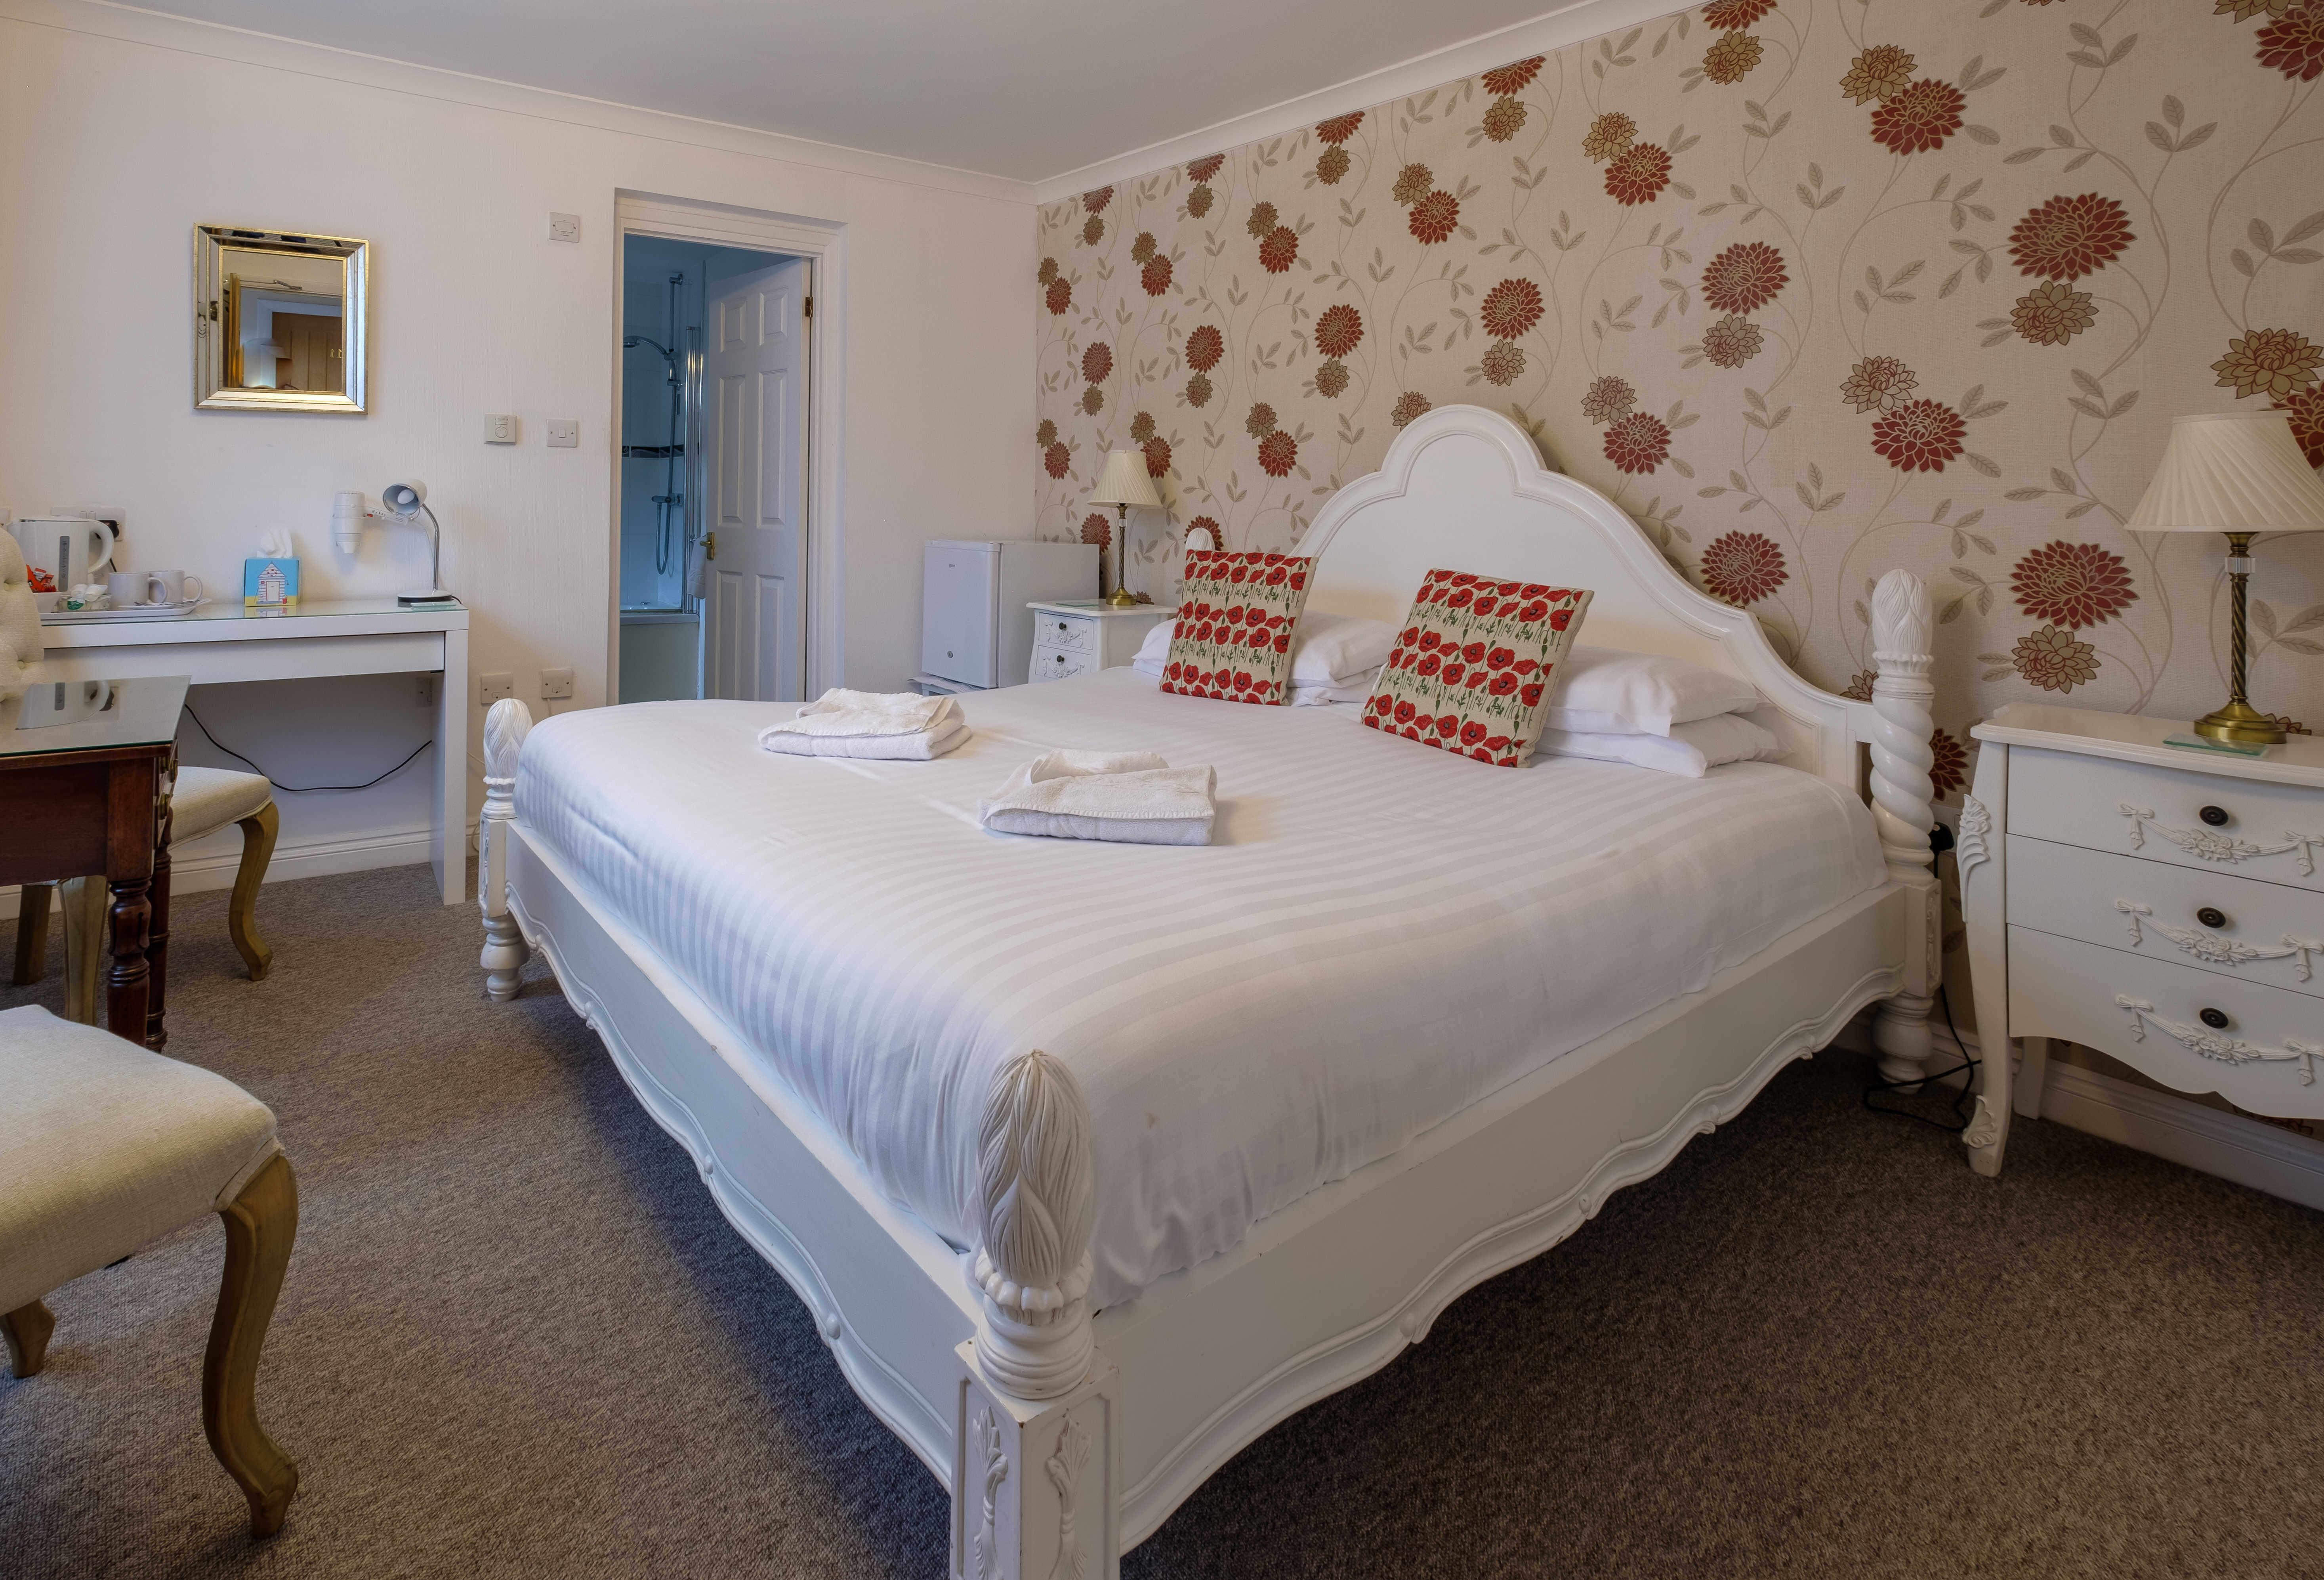 Newport Quay Hotel Room 12 Superior Double Room Super King Bed